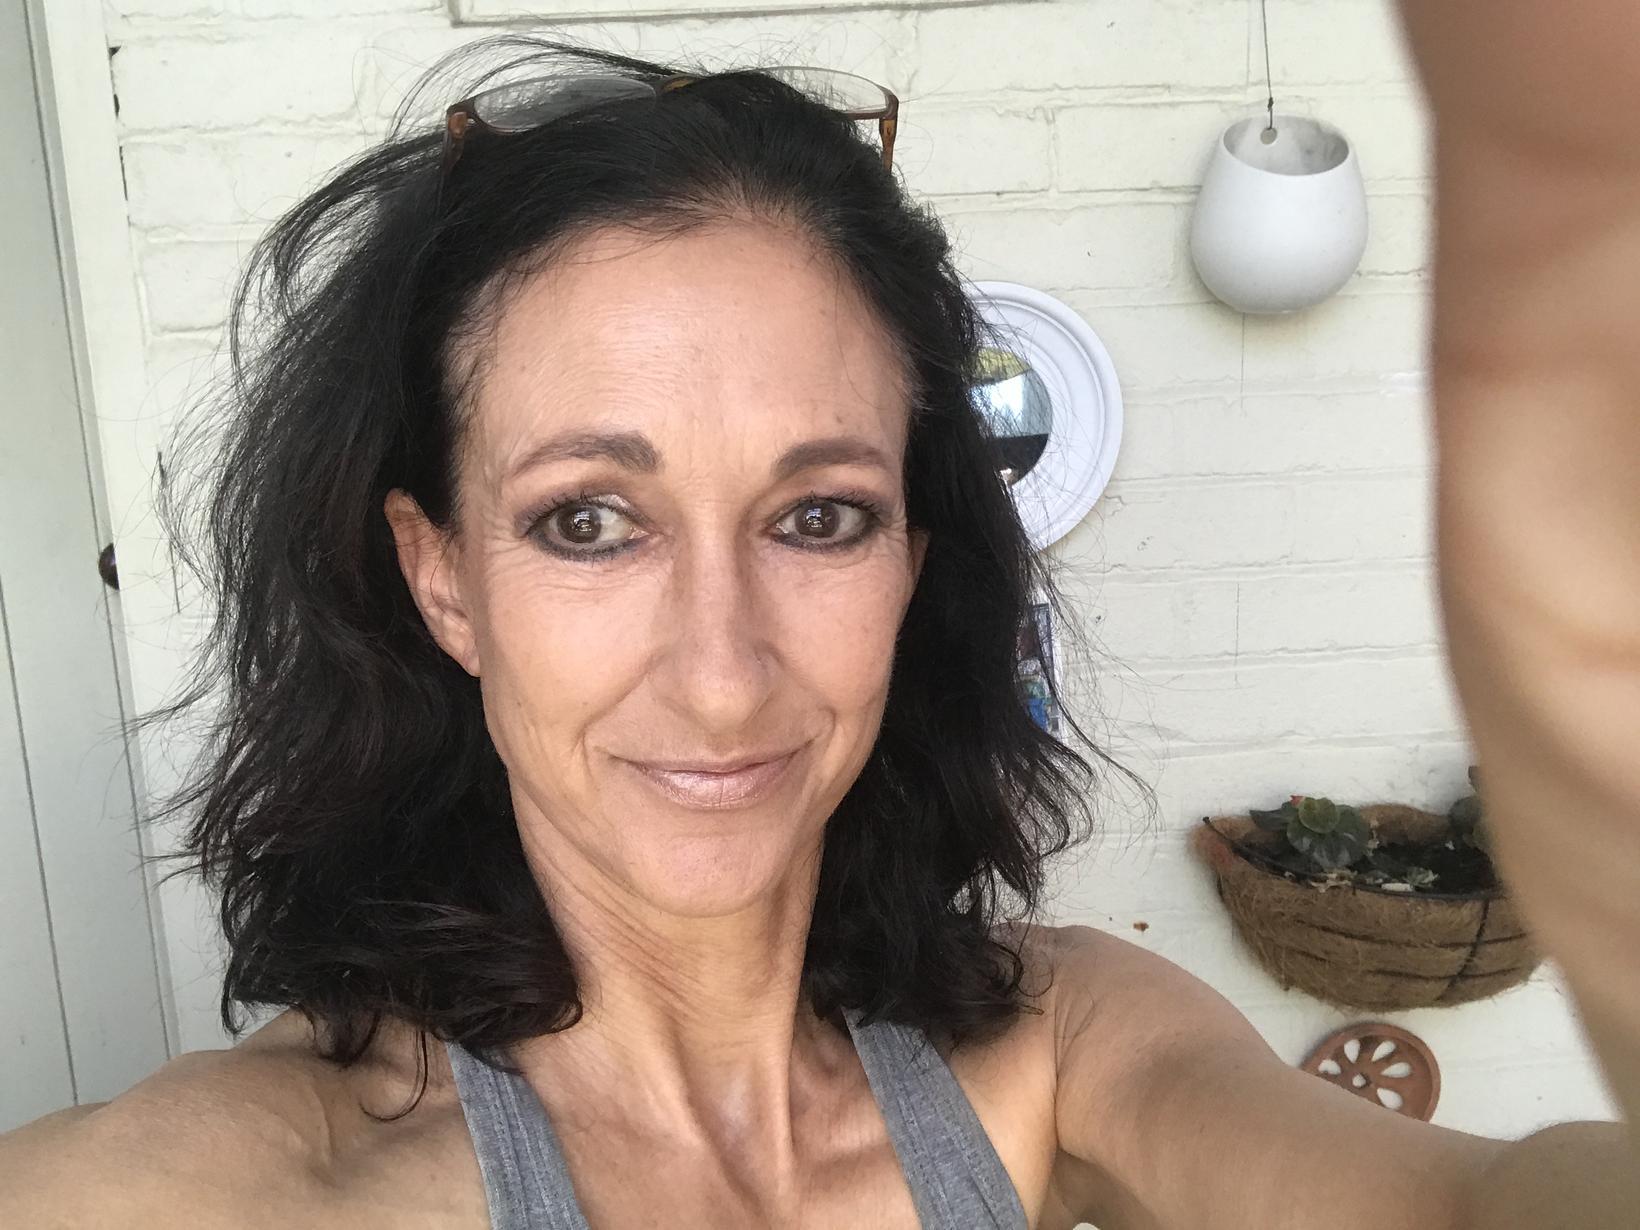 Natalie from Perth, Western Australia, Australia